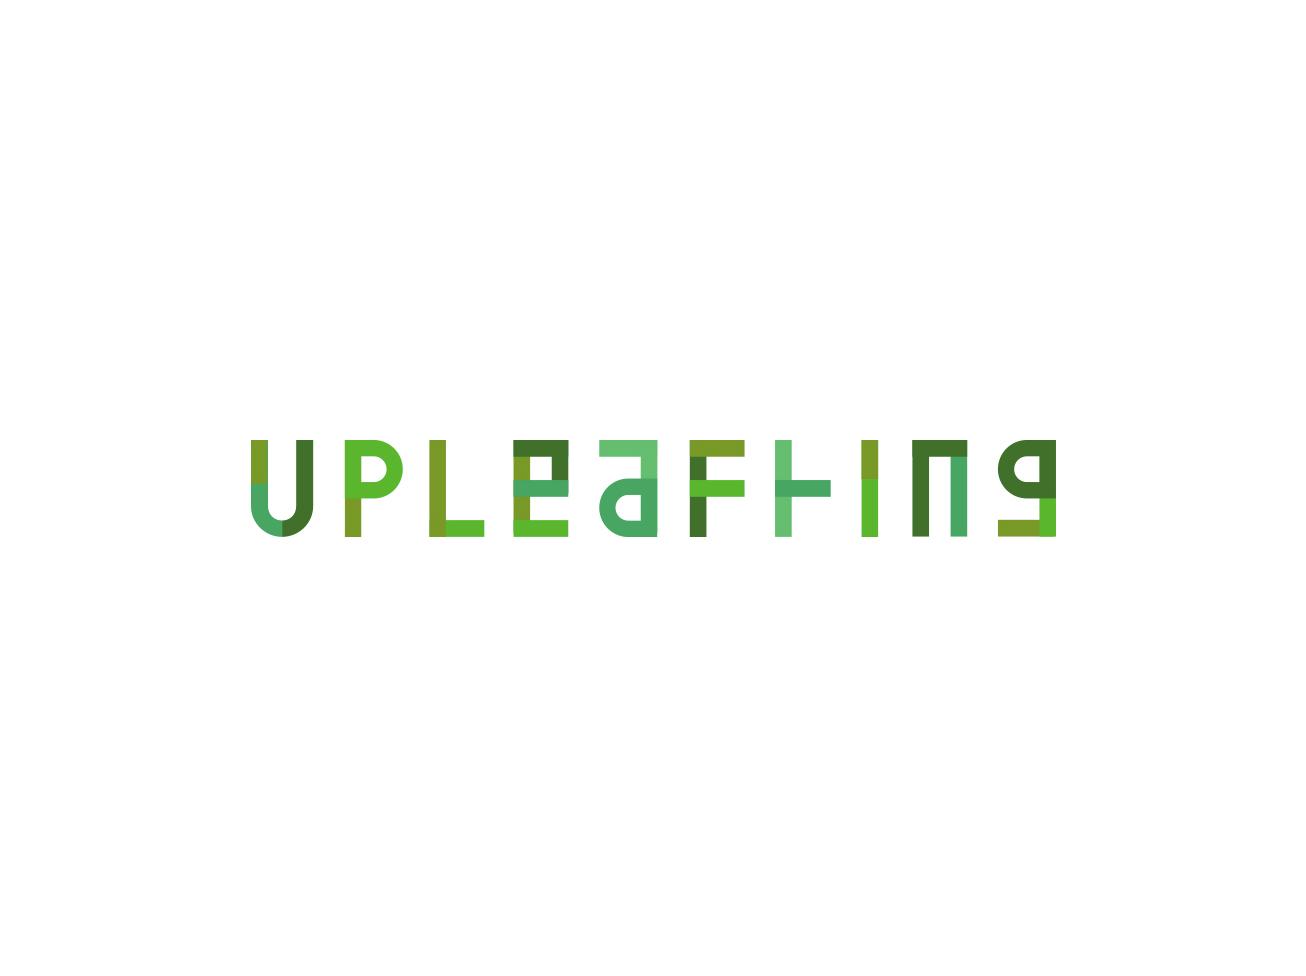 clvstr-sqsp-upleafting-page.jpg